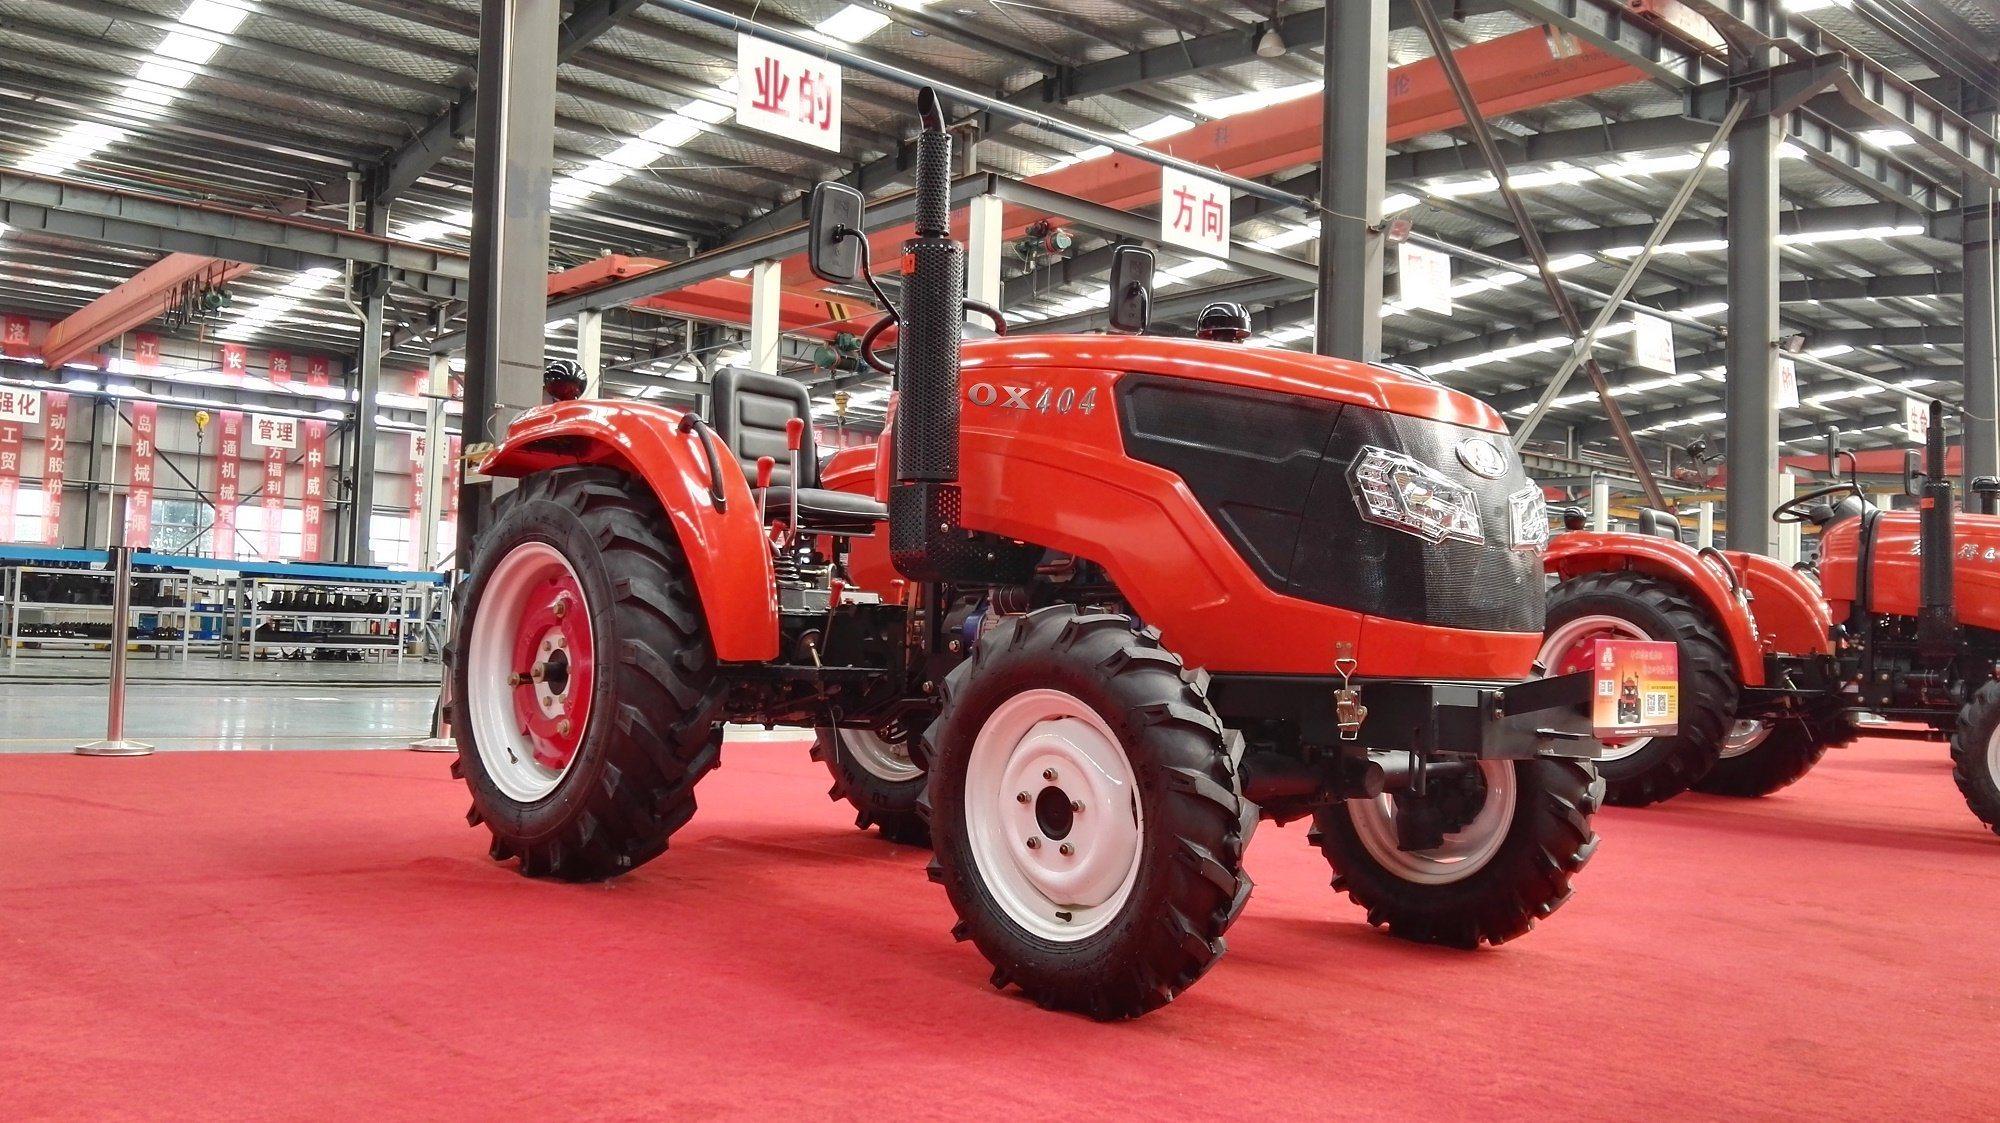 New 404 Four-Wheel Driving Wheel Tractor with Diesel Engine Kubota Type